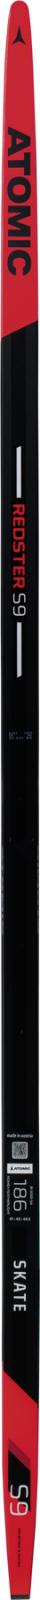 Atomic Redster S9 X Stiff